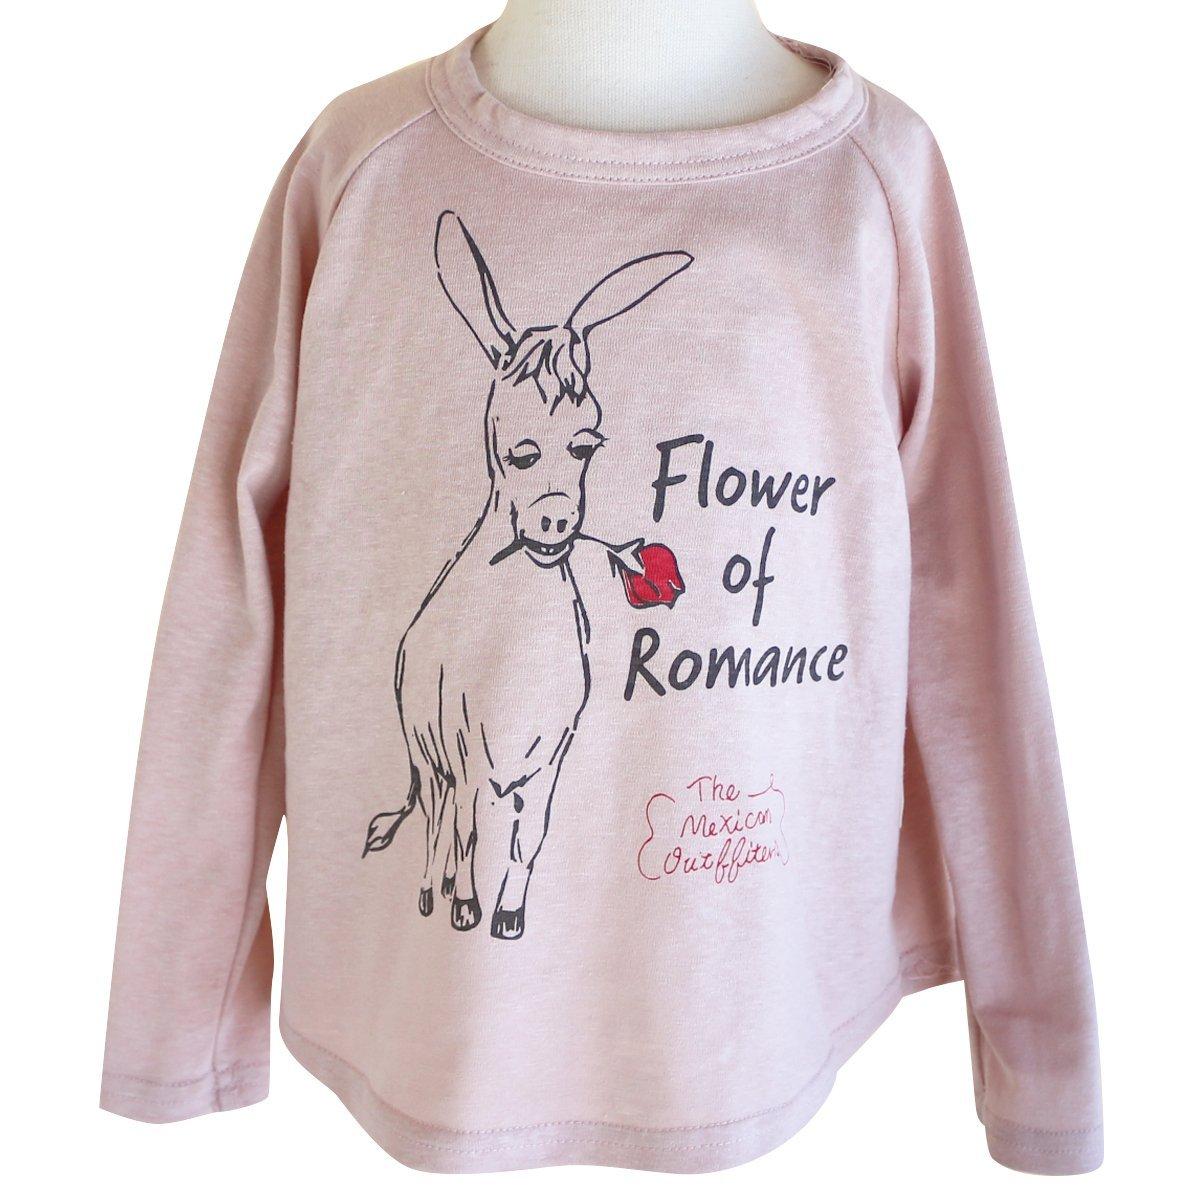 DE NACHOS デナチョス FLOWER OF ROMANCE TEE ピンク L DN-18509 B07FPL5PQD 80  80